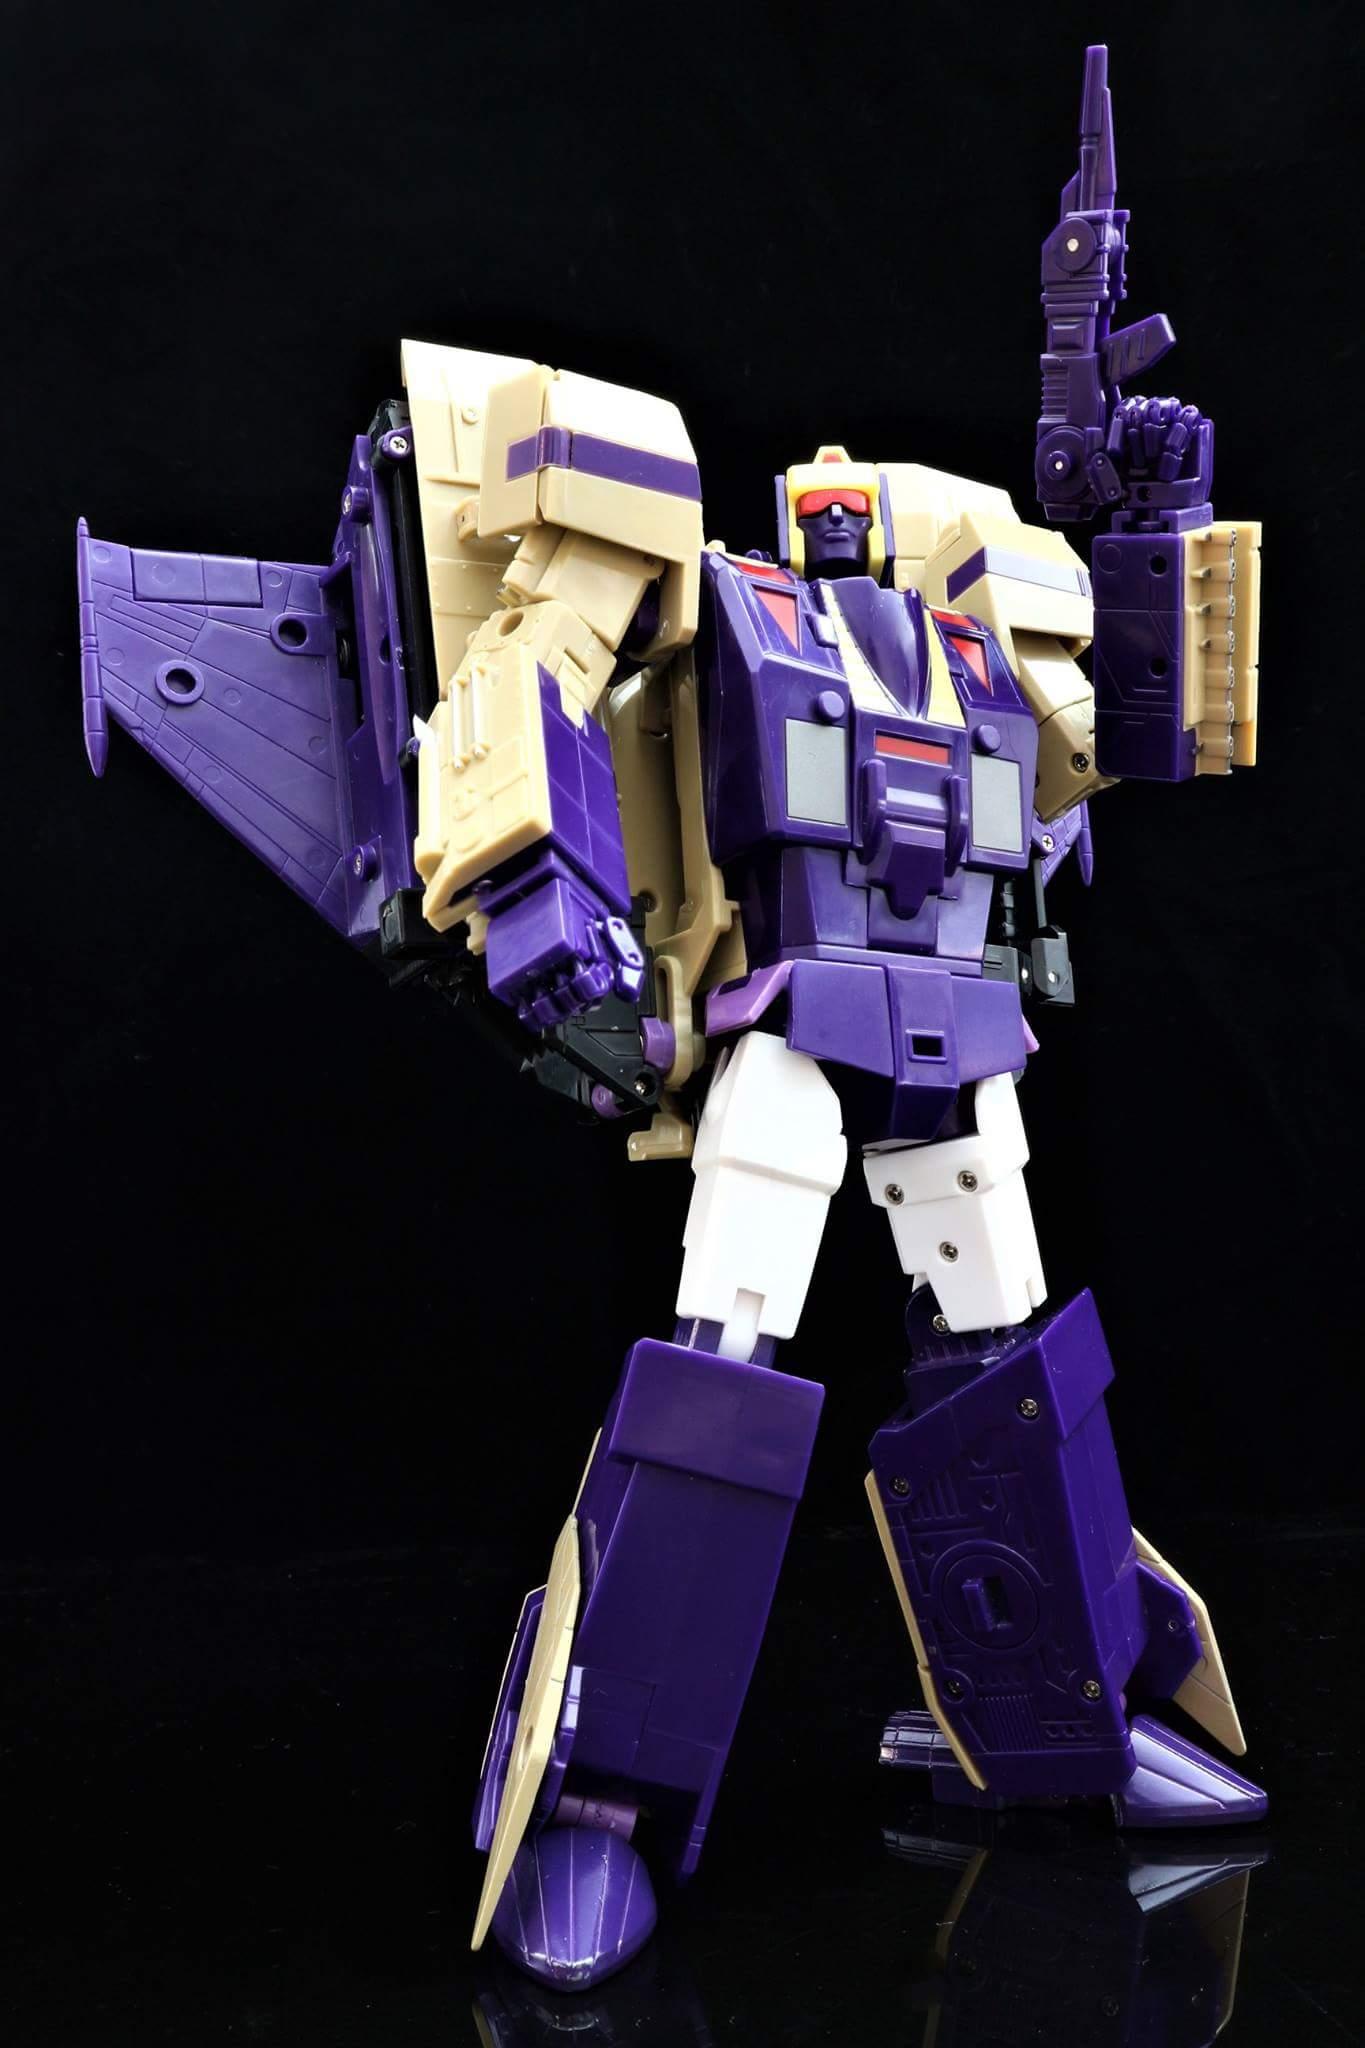 [KFC Toys] Produit Tiers - Jouet Phase 7-A Ditka - aka Blitzwing/Le Blitz - Page 4 ZHzRhOGh